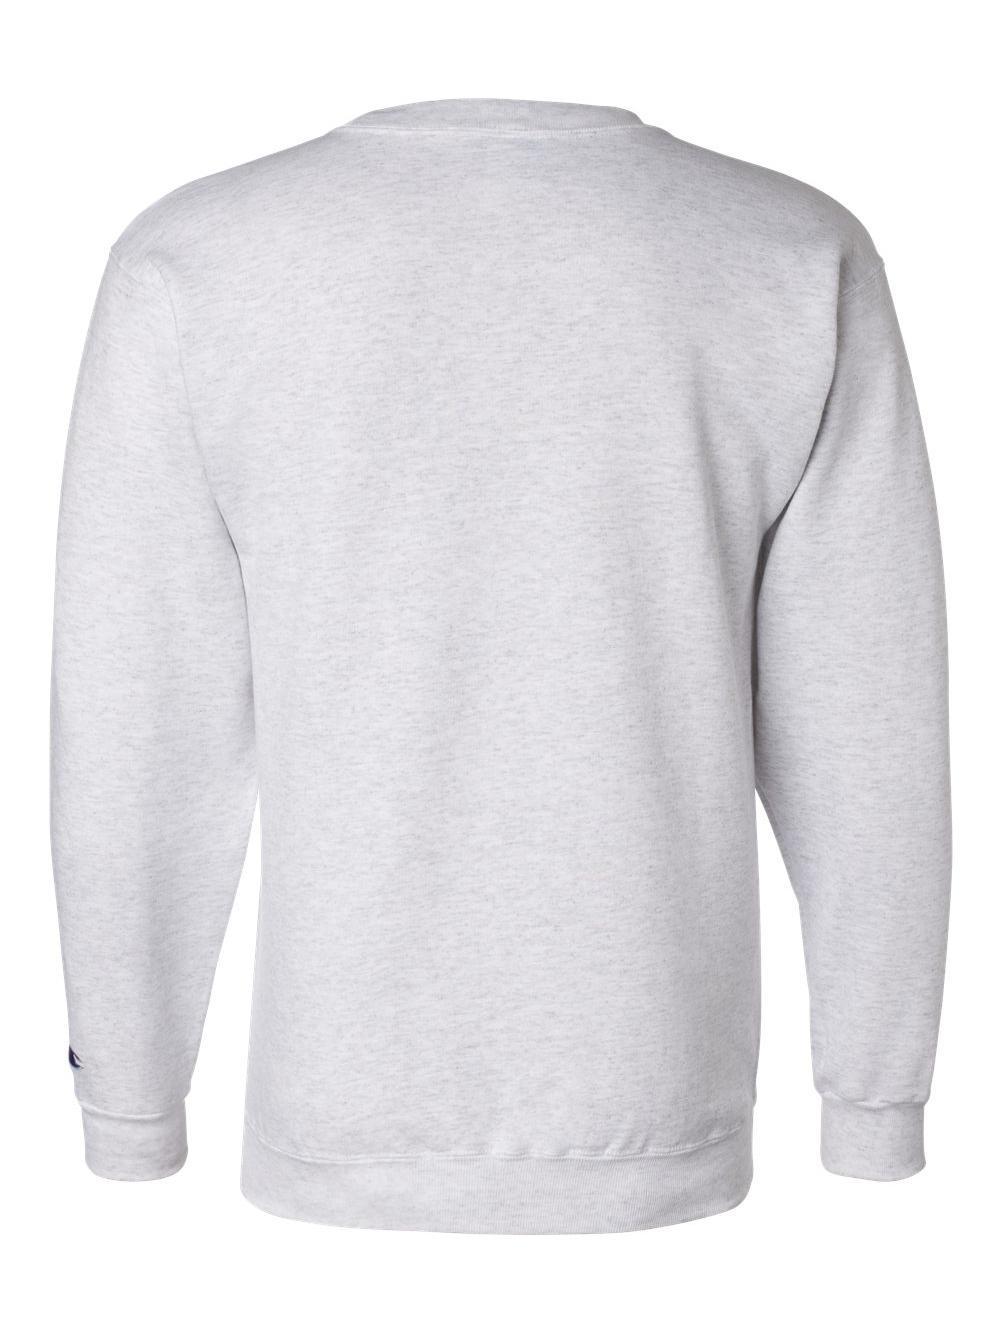 Champion-Double-Dry-Eco-Crewneck-Sweatshirt-S600 thumbnail 34